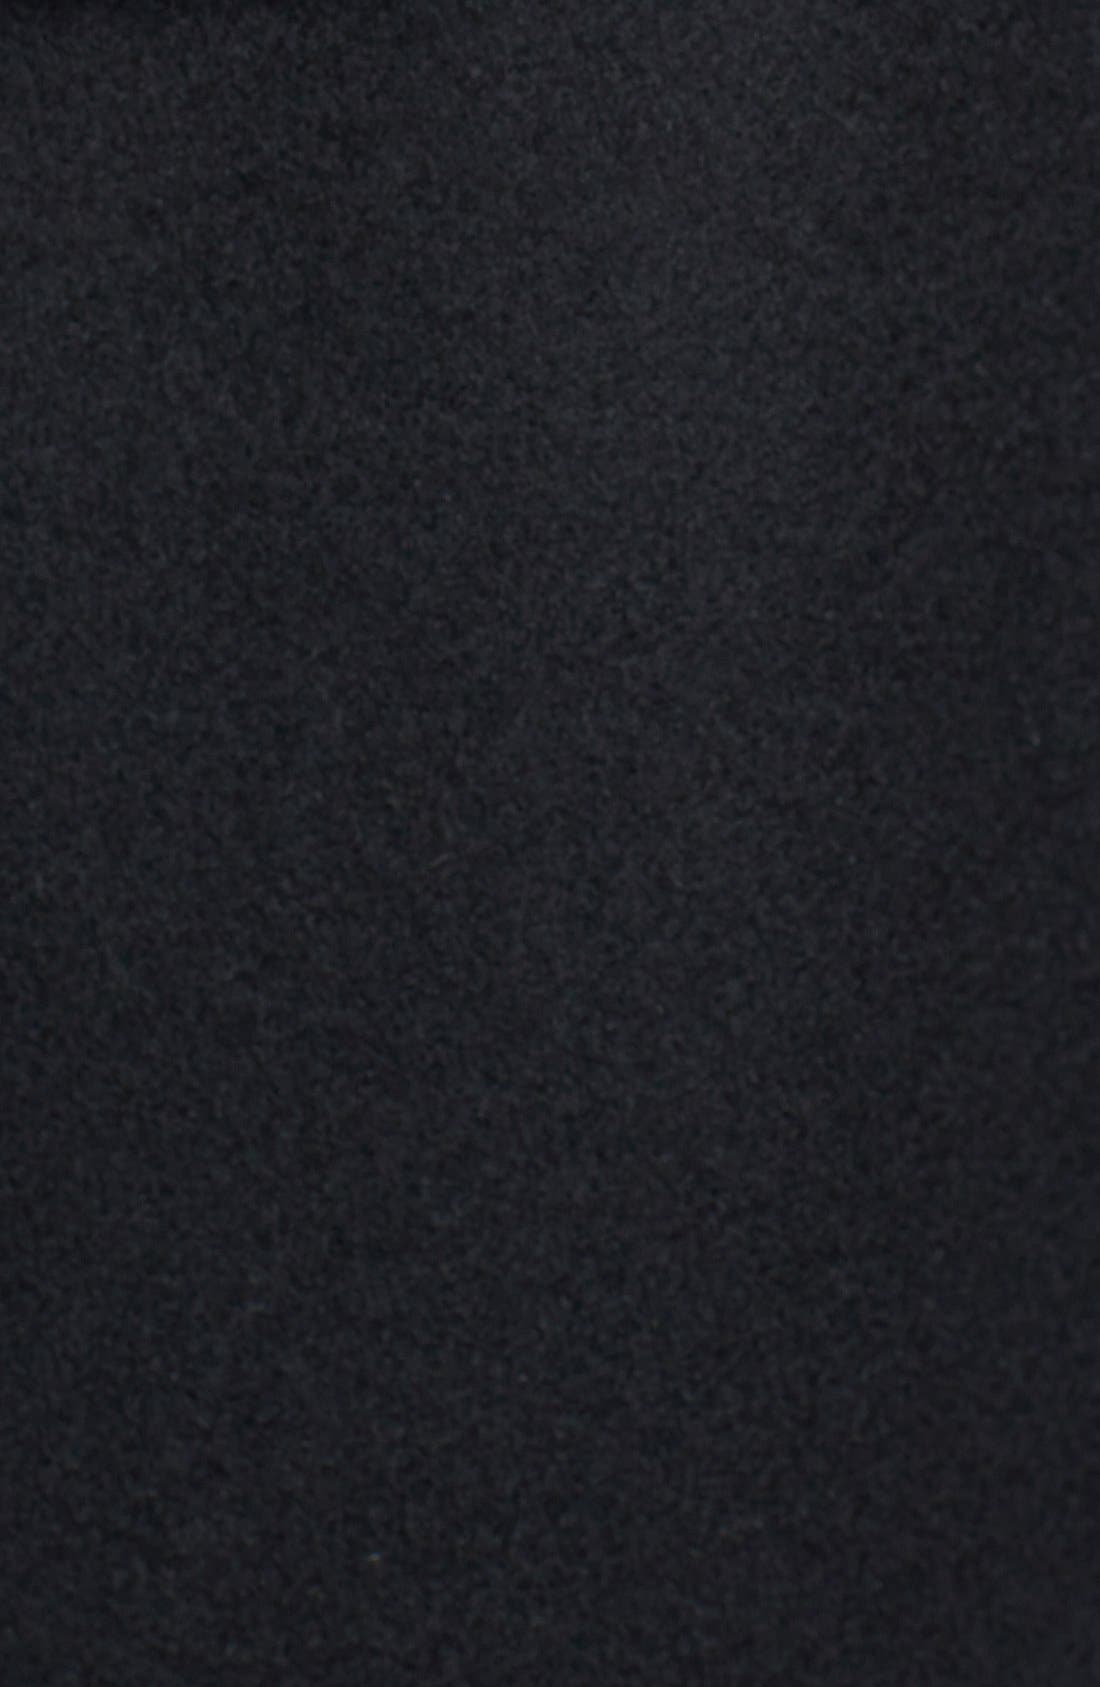 Genuine Fox Fur Trim Hooded Wool Blend Coat,                             Alternate thumbnail 9, color,                             001